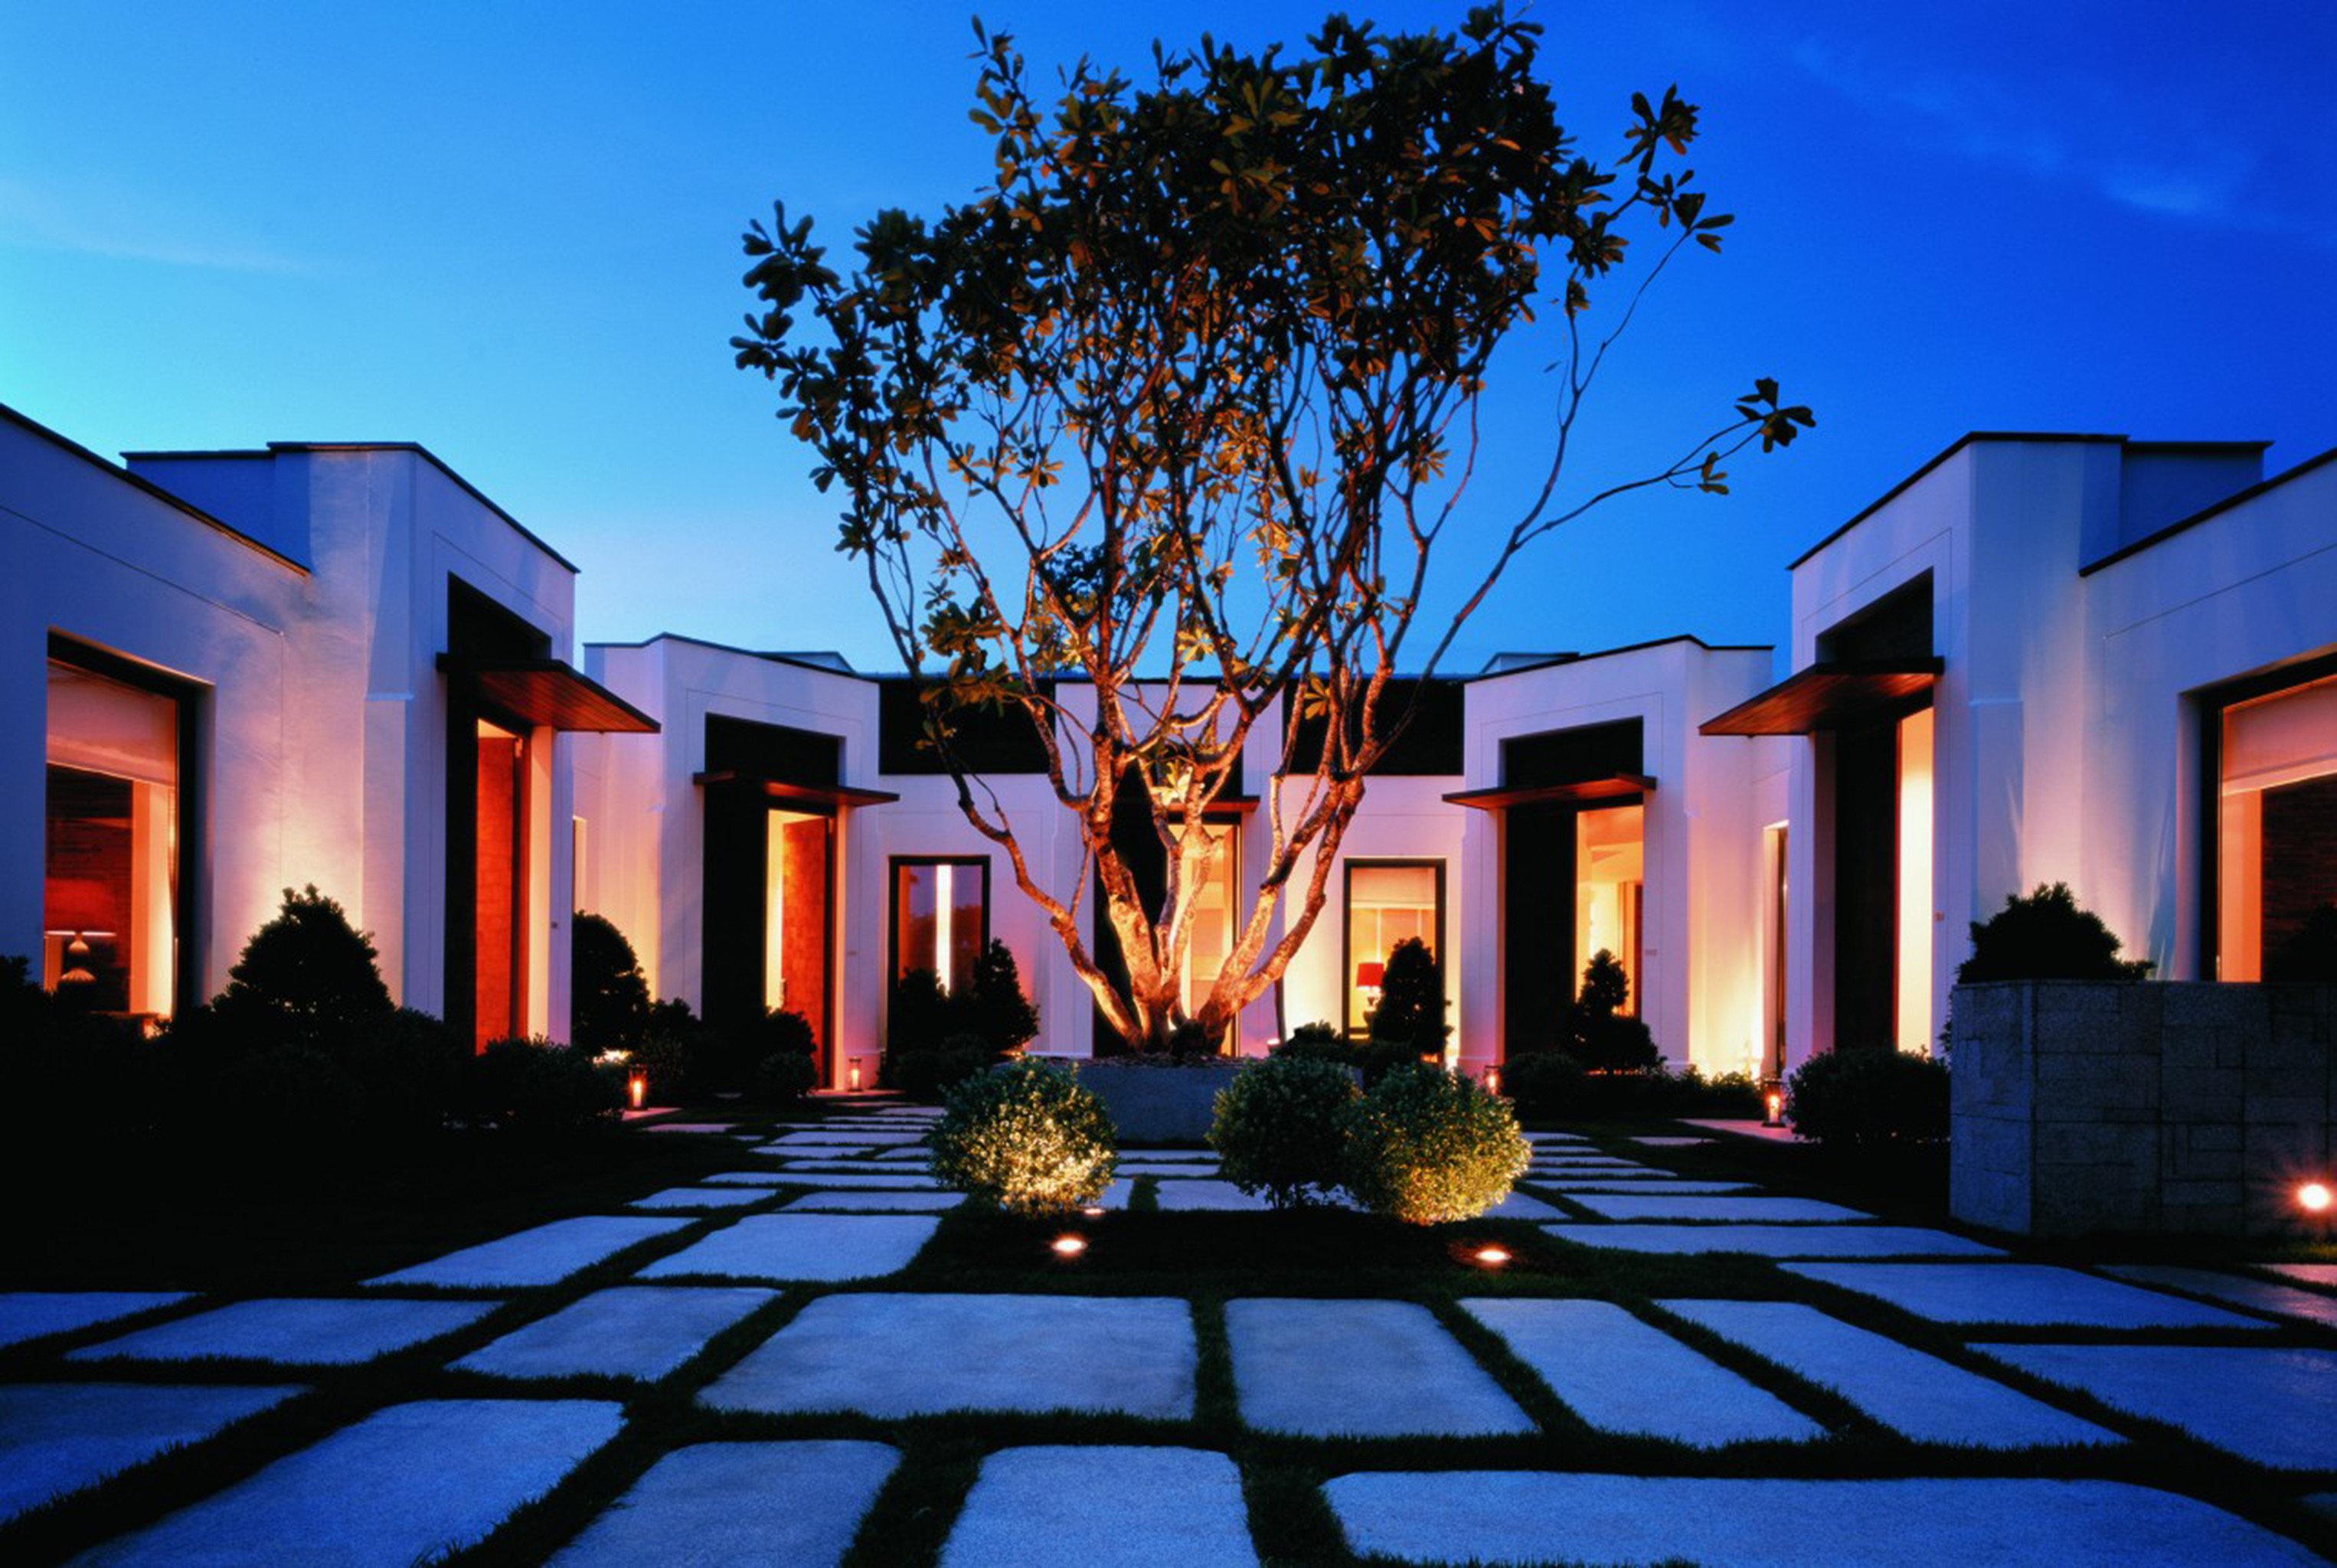 City Courtyard sky building house home Resort landscape lighting lighting evening mansion hacienda Villa